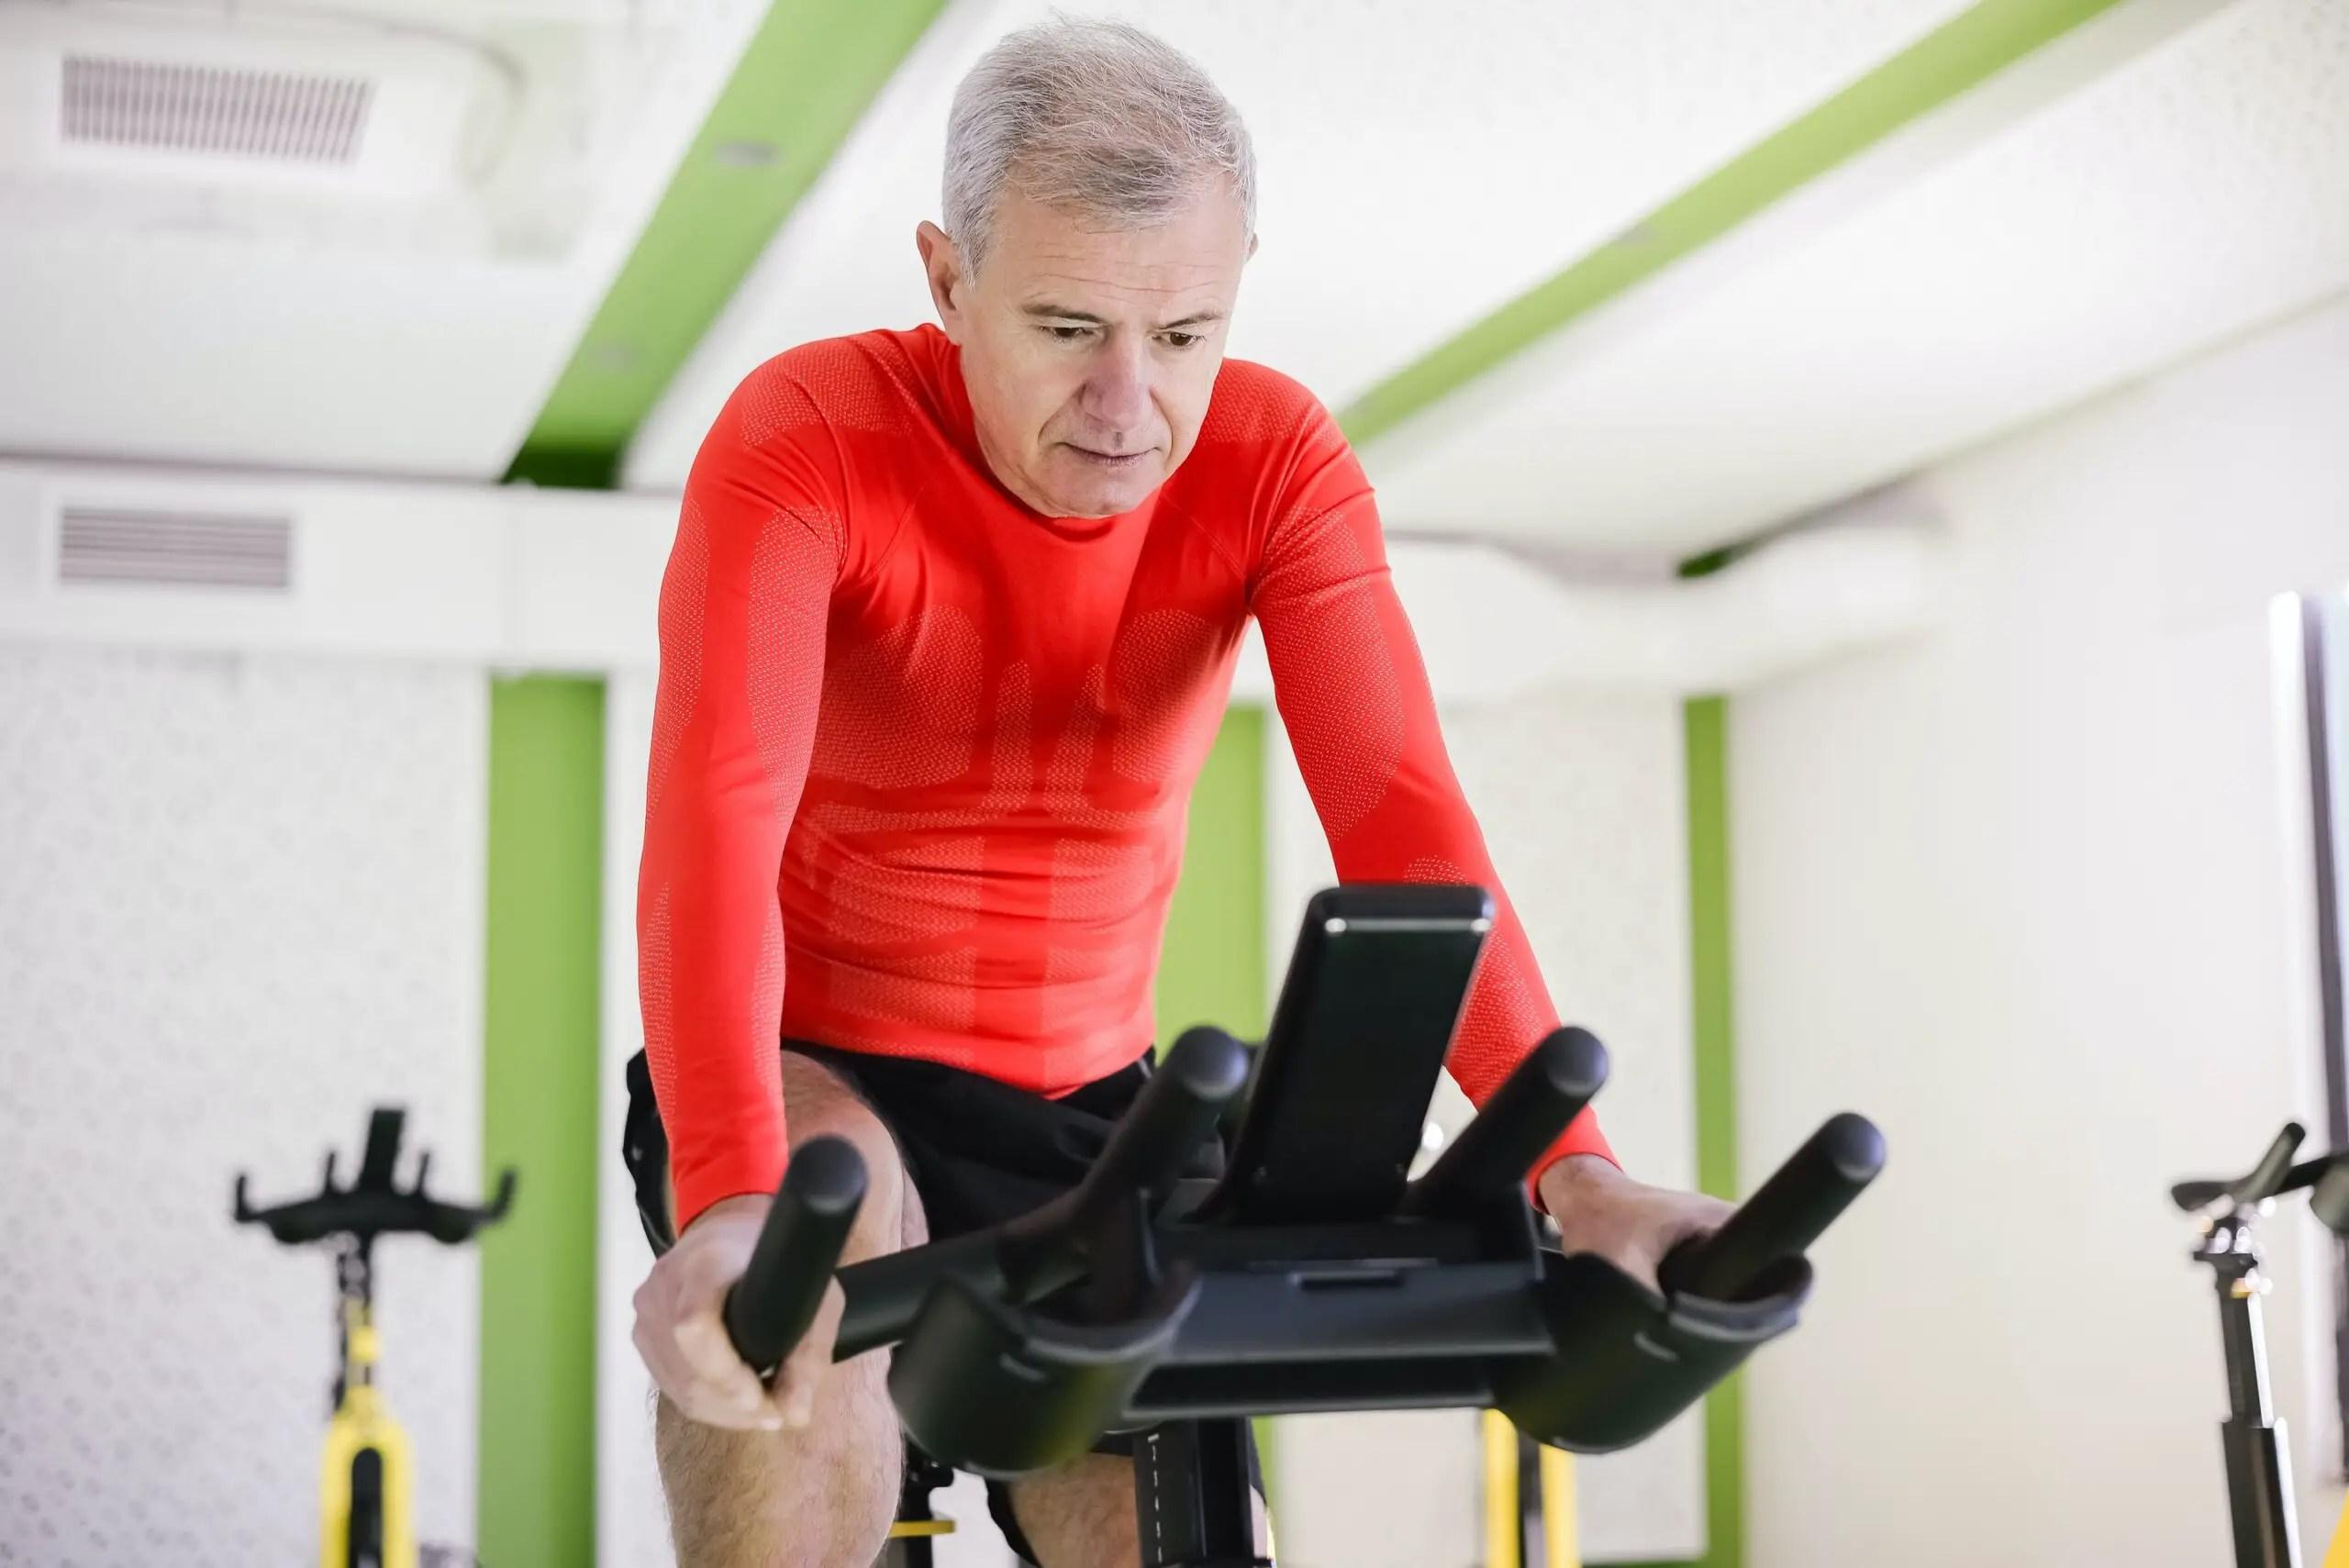 How Many Calories Does A Stationary Bike Burn?